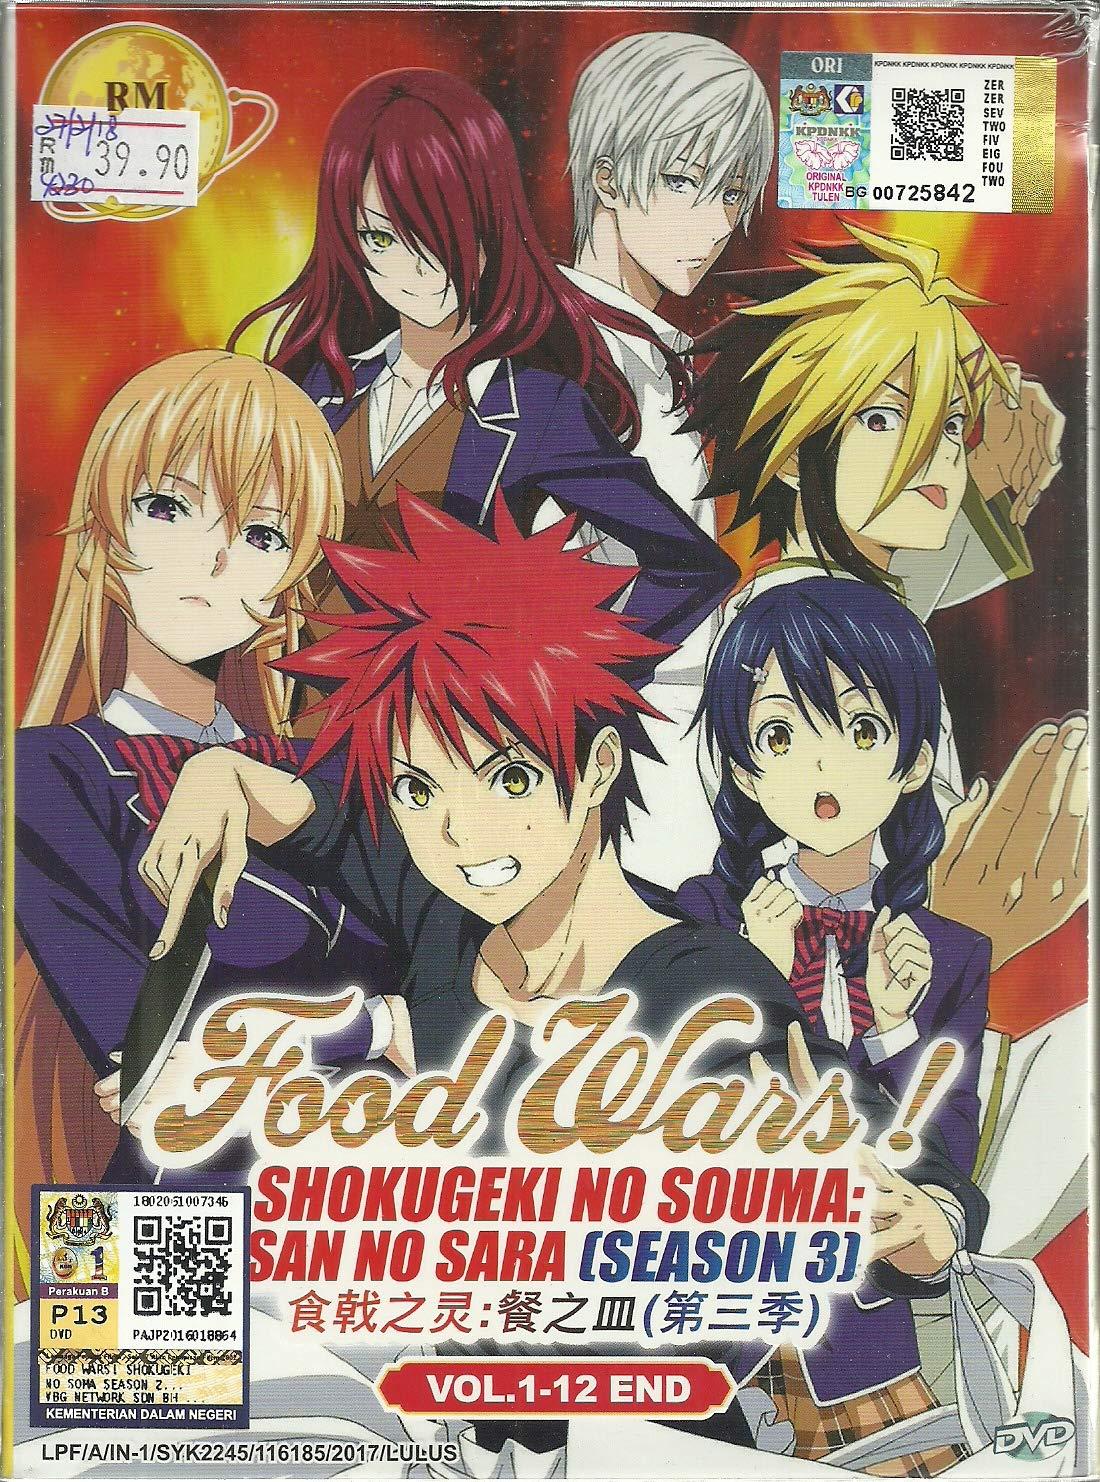 FOOD WARS! SHOKUGEKI NO SOUMA : SAN NO SARA (SEASON 3) ( PART 1 ) - COMPLETE ANIME TV SERIES DVD BOX SET (12 EPISODES)